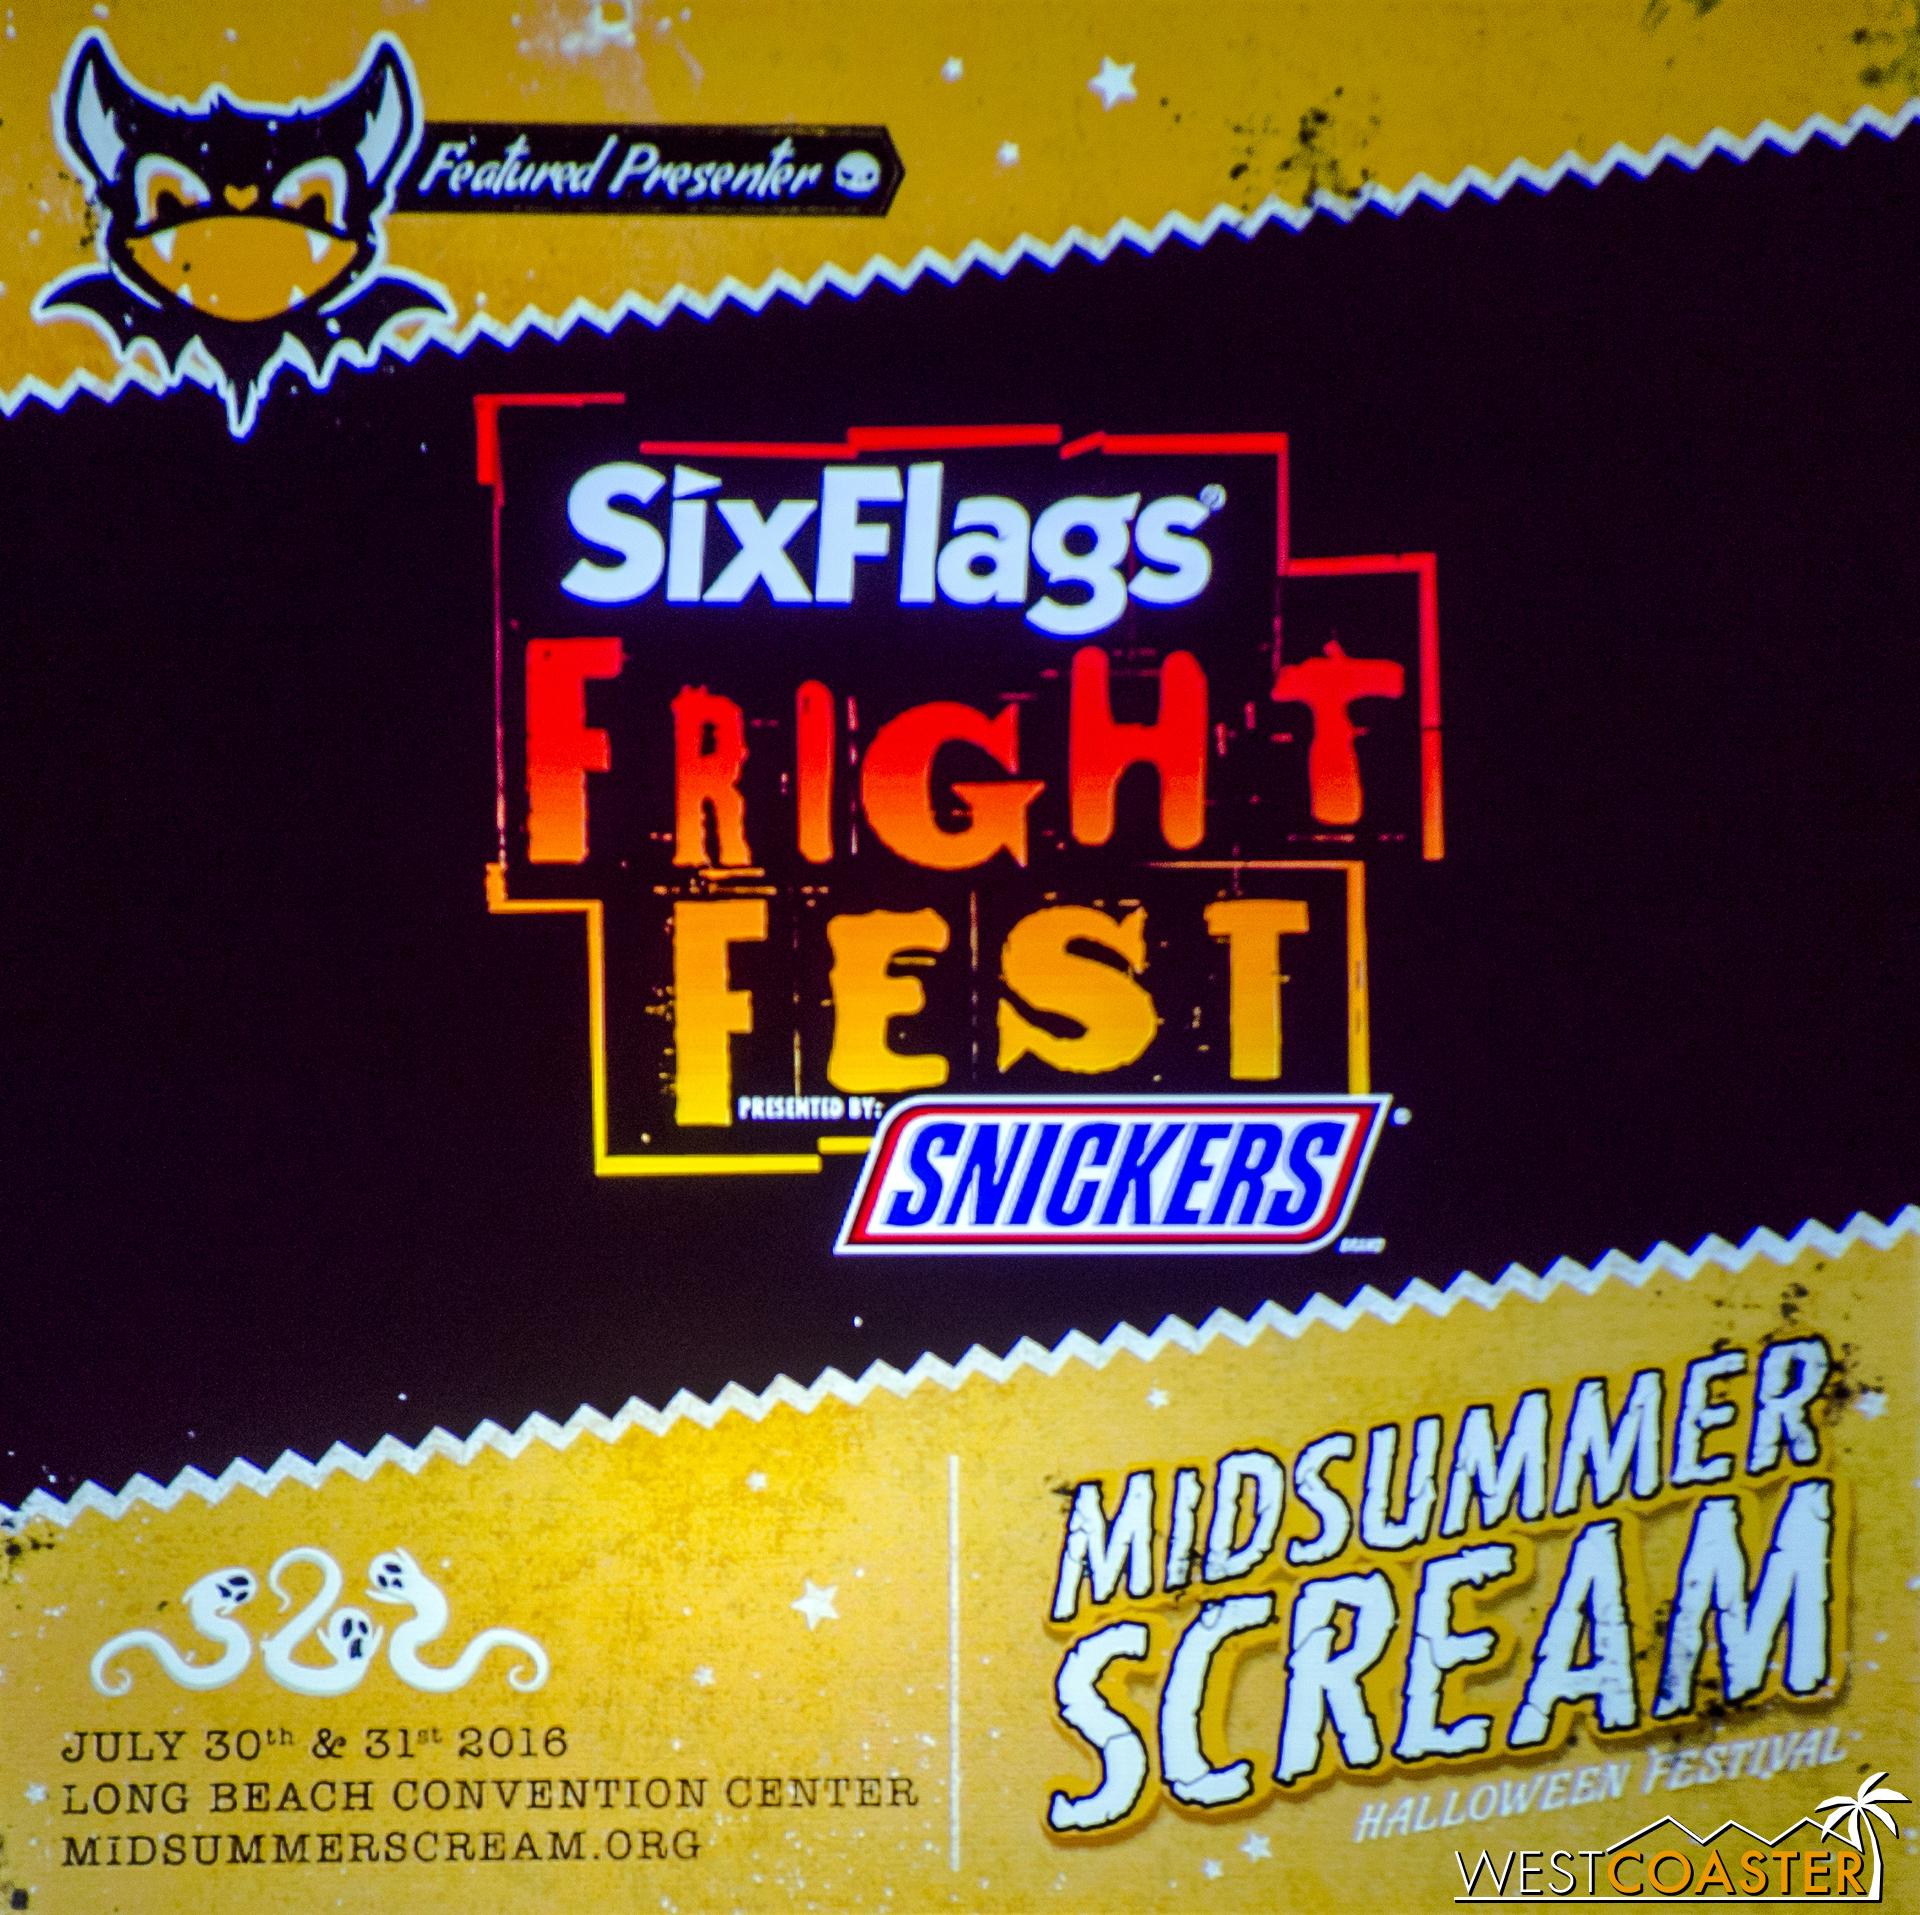 MSS2016-SFMMFF-Slides-0001.jpg